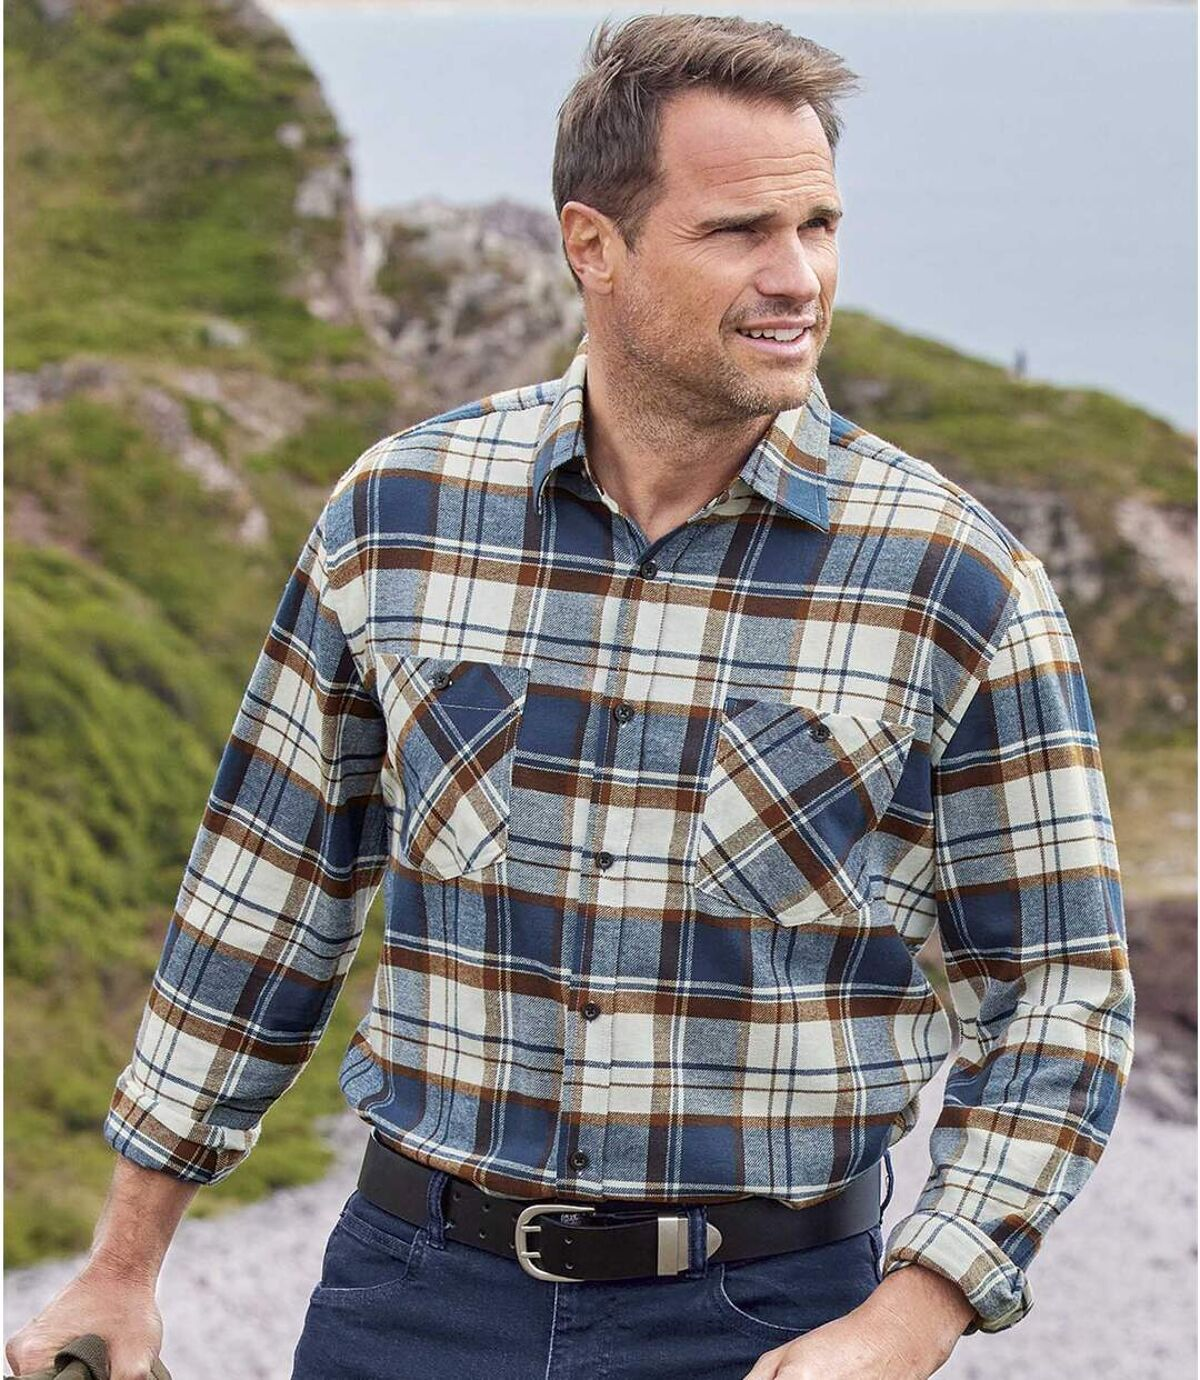 Men's Casual Checked Flannel Shirt - Navy, Brown, Ecru Atlas For Men